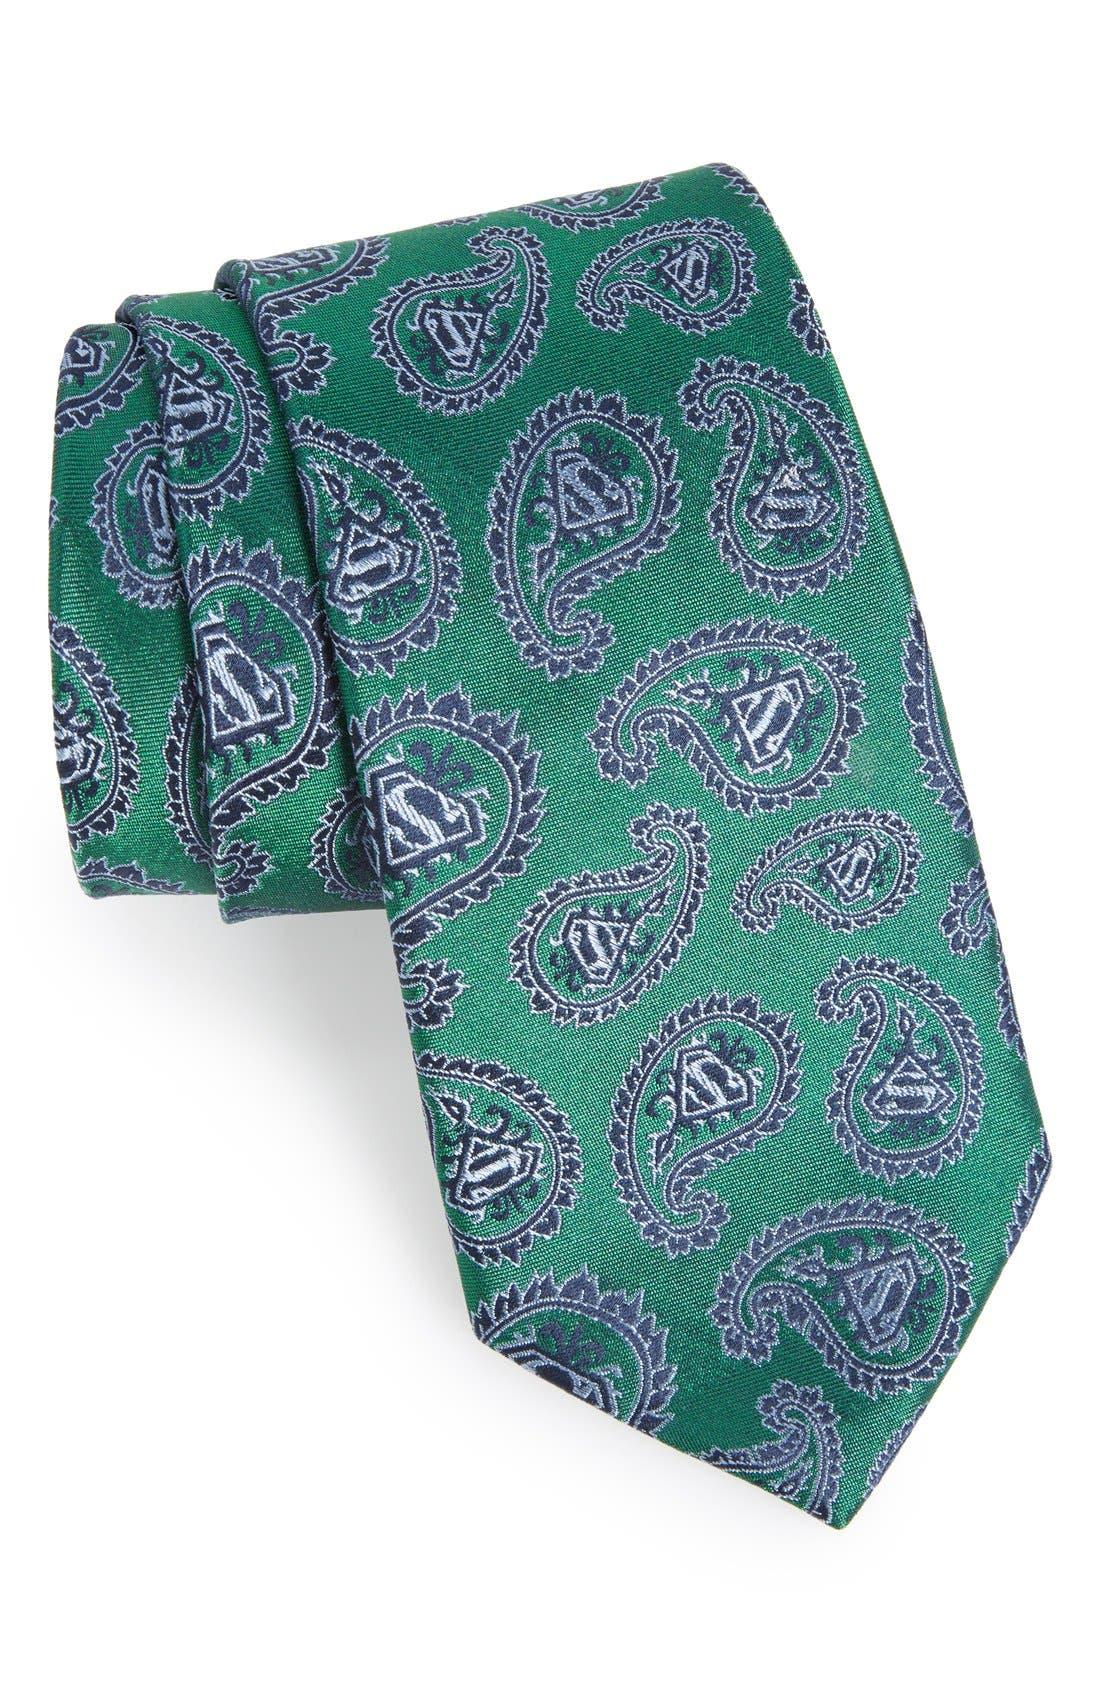 CUFFLINKS, INC. Superman Paisley Silk Tie